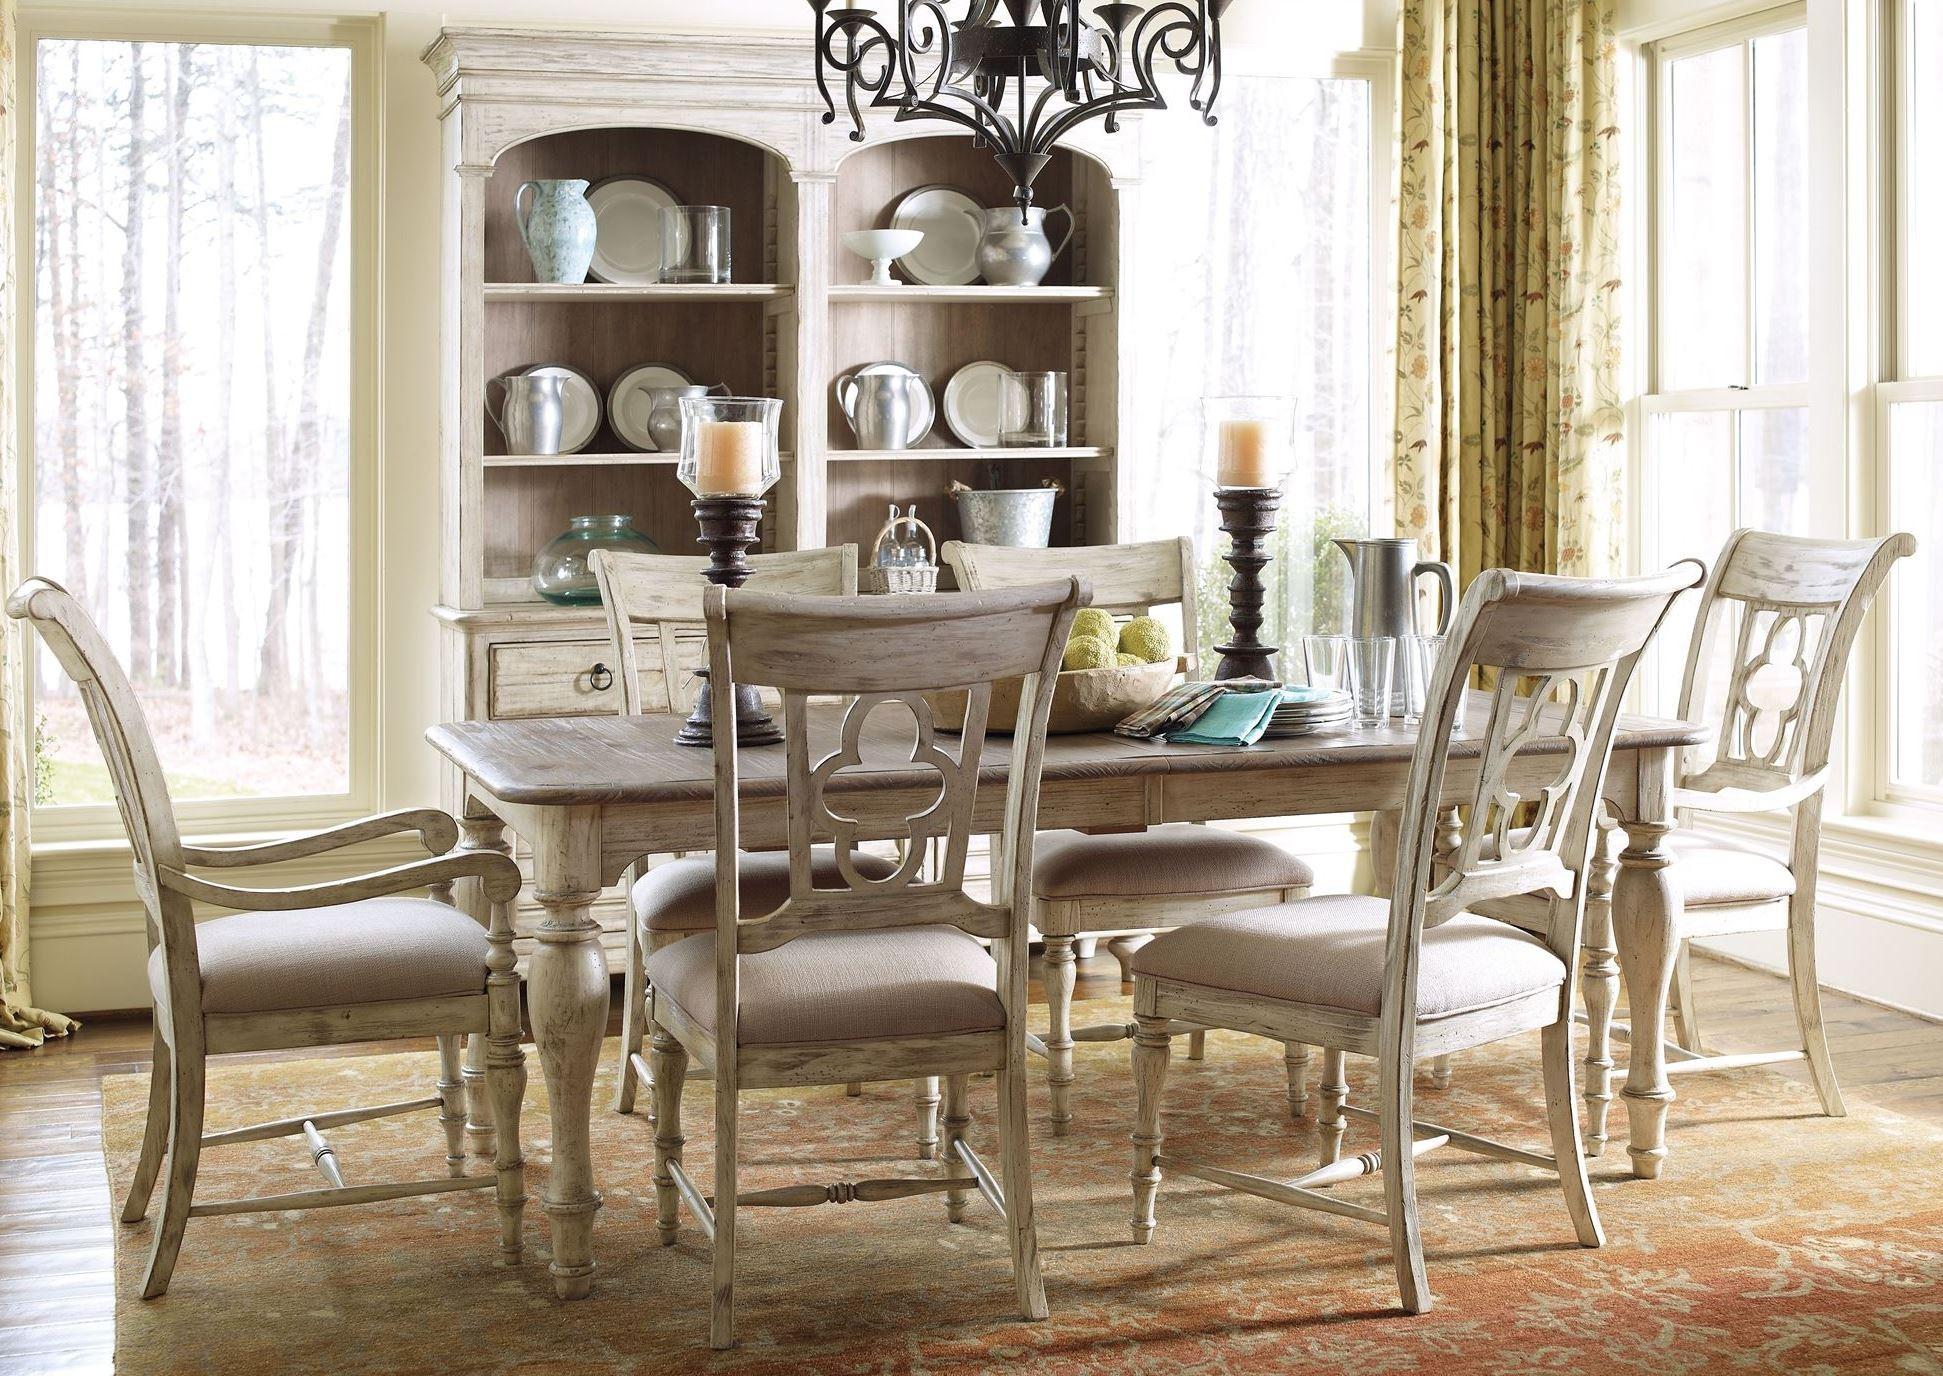 Attrayant Weatherford Cornsilk Canterbury Extendable Rectangular Dining Room Set From  Kincaid (75 054) | Coleman Furniture